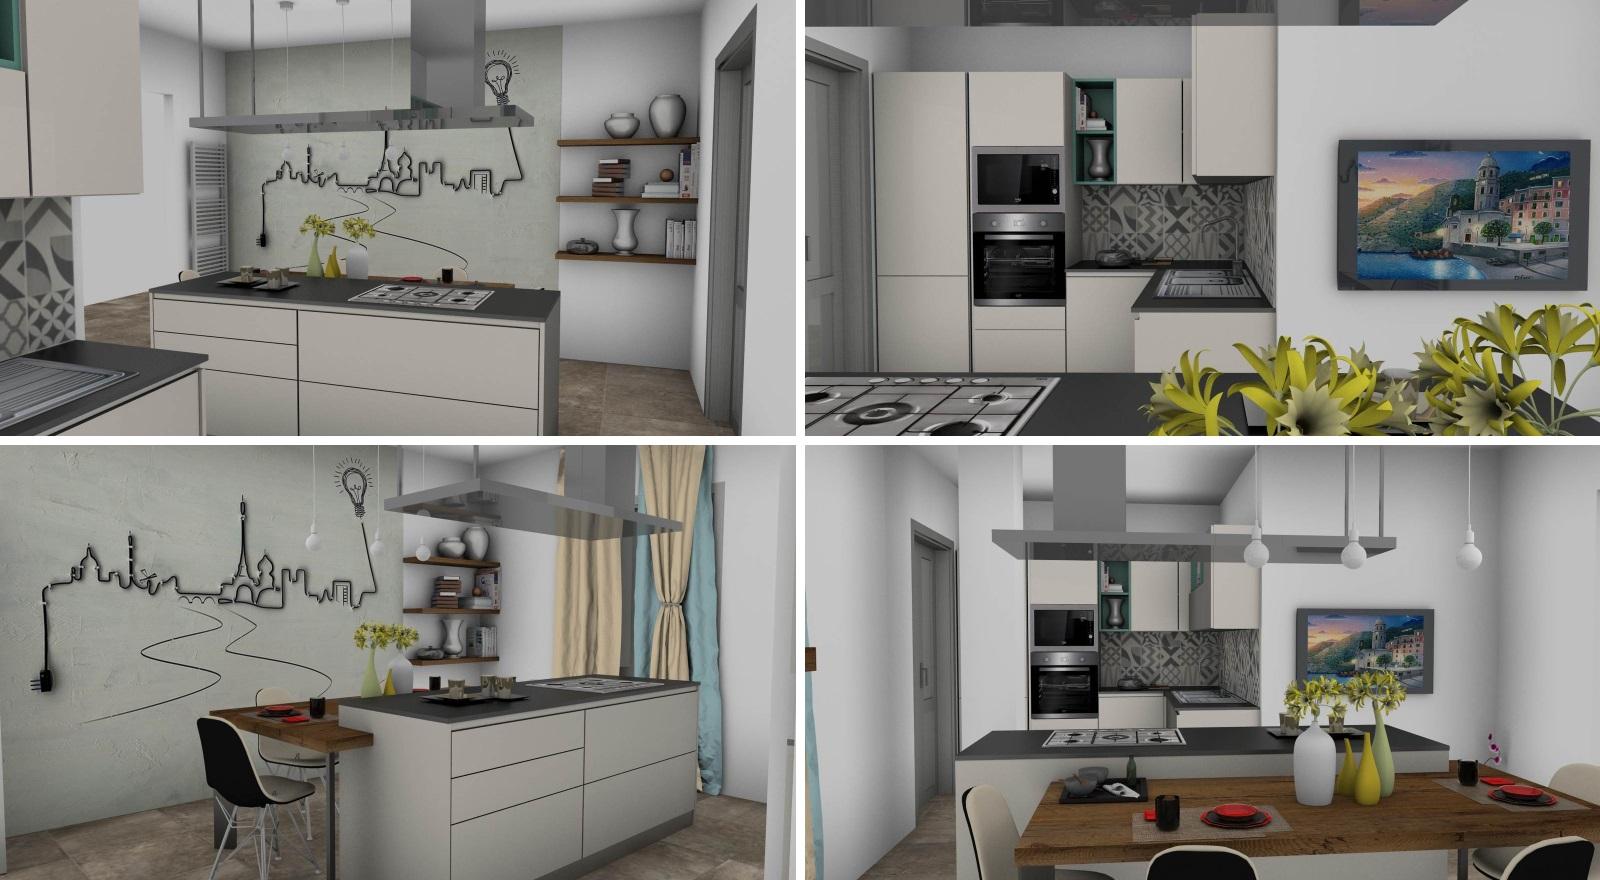 cucina Sistematica rendering 3